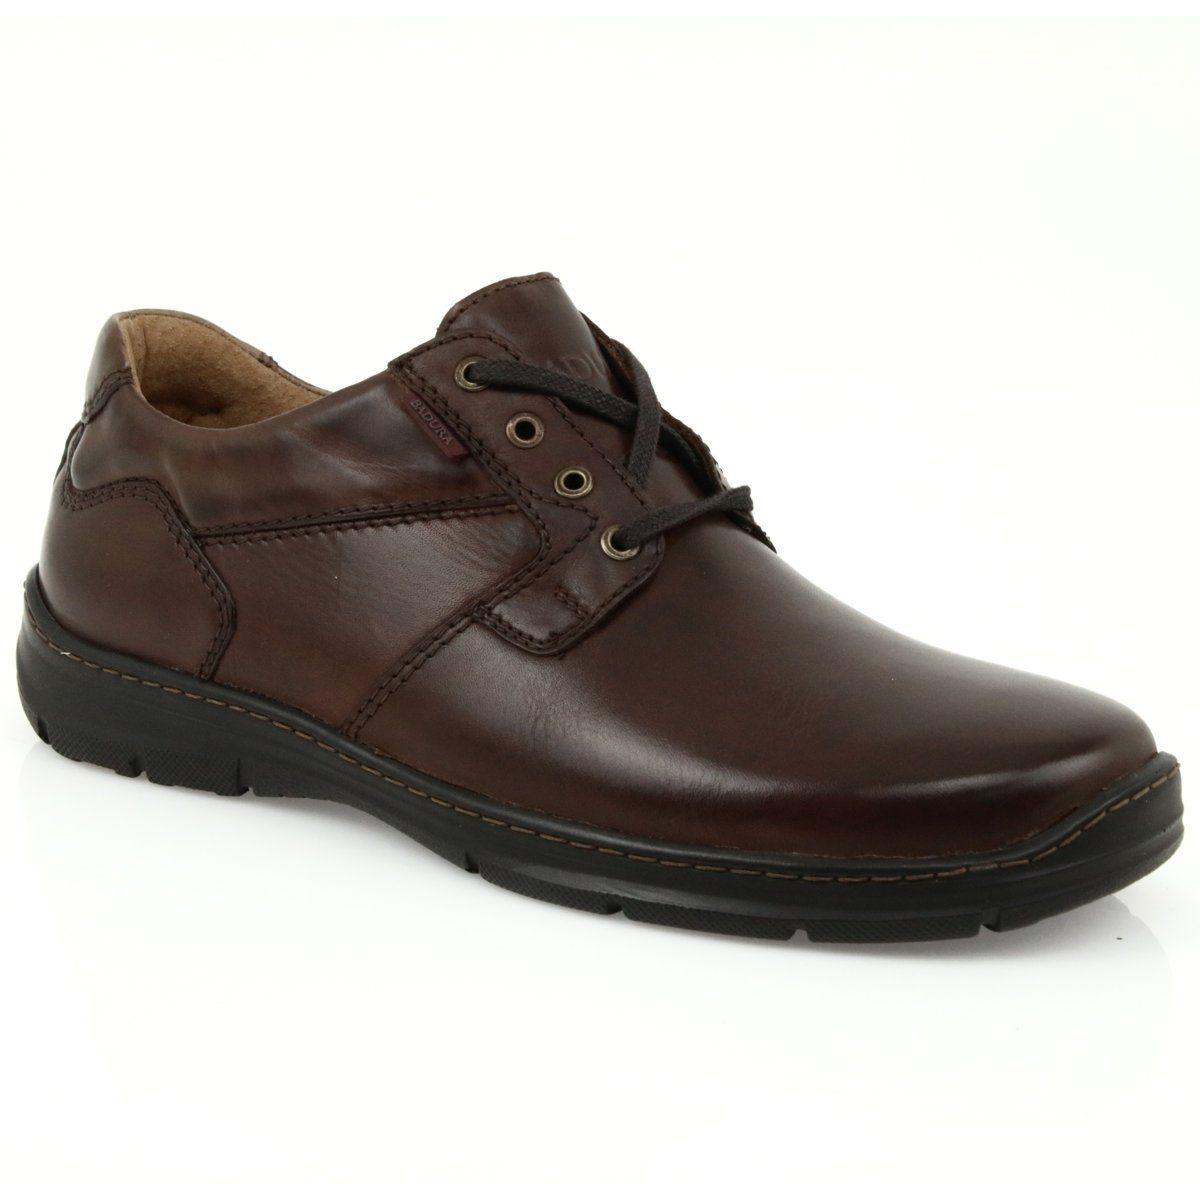 Badura Buty Meskie Komfort 3509 Brazowe Dress Shoes Men Casual Shoes School Shoes